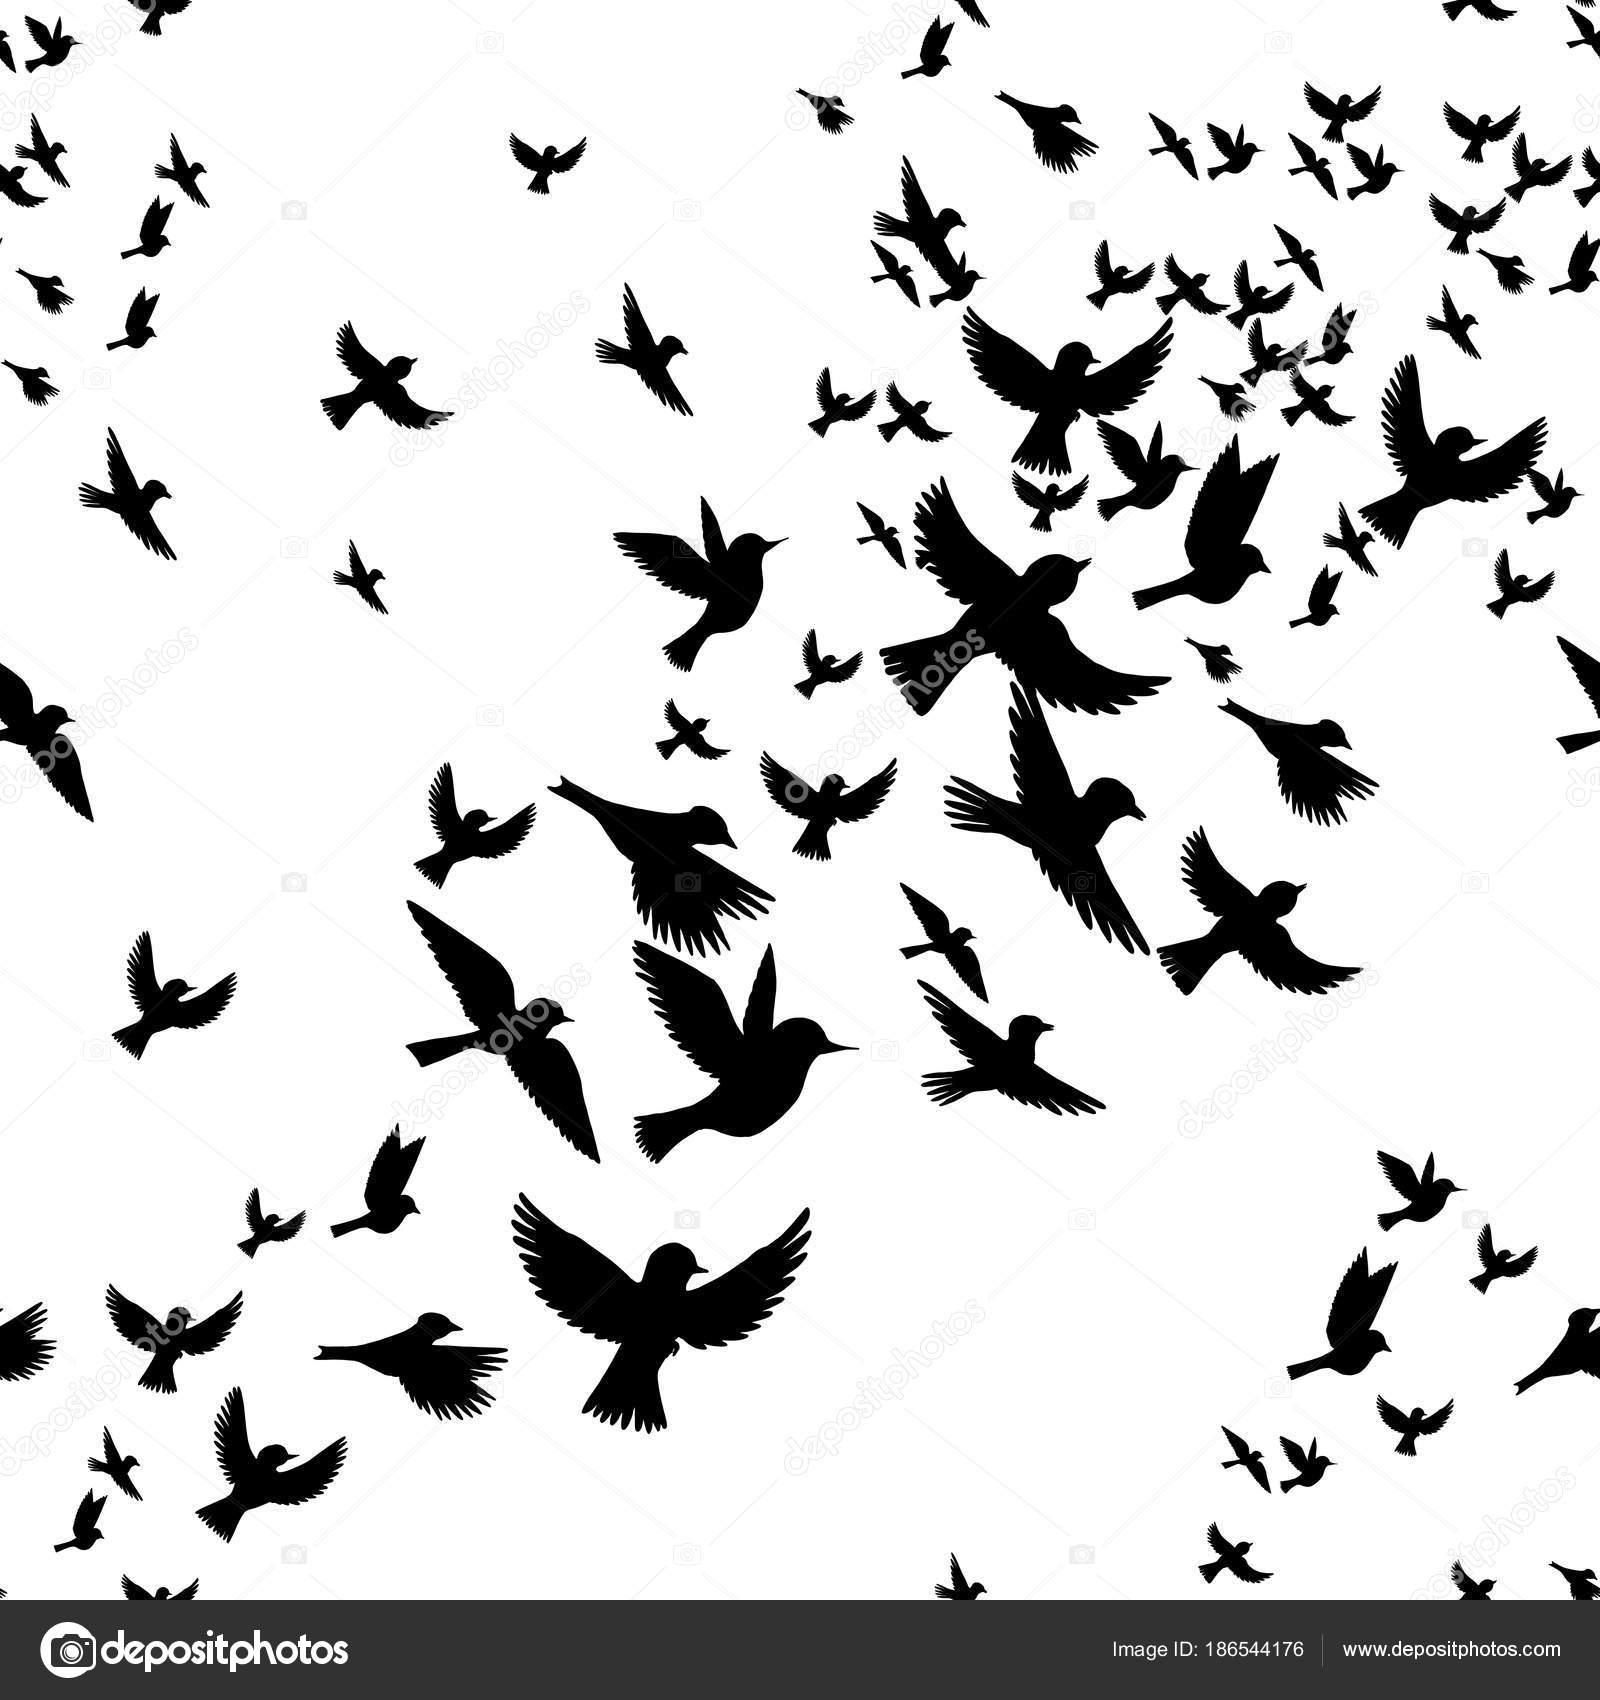 patrón sin costuras Vector con aves — Vector de stock ...